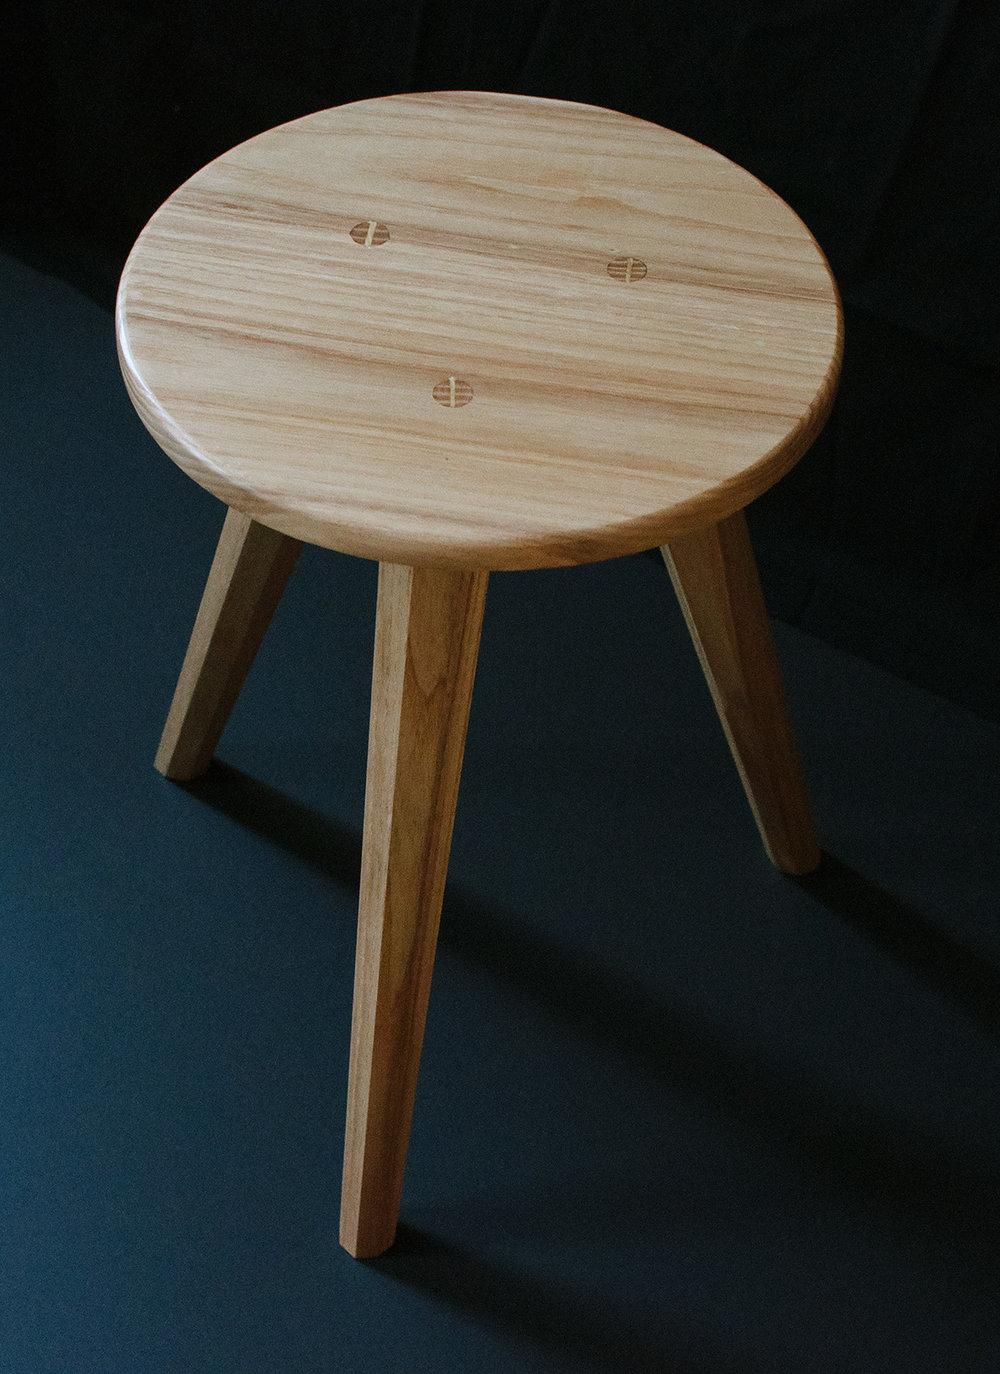 butternut-ash-stool-2.jpg